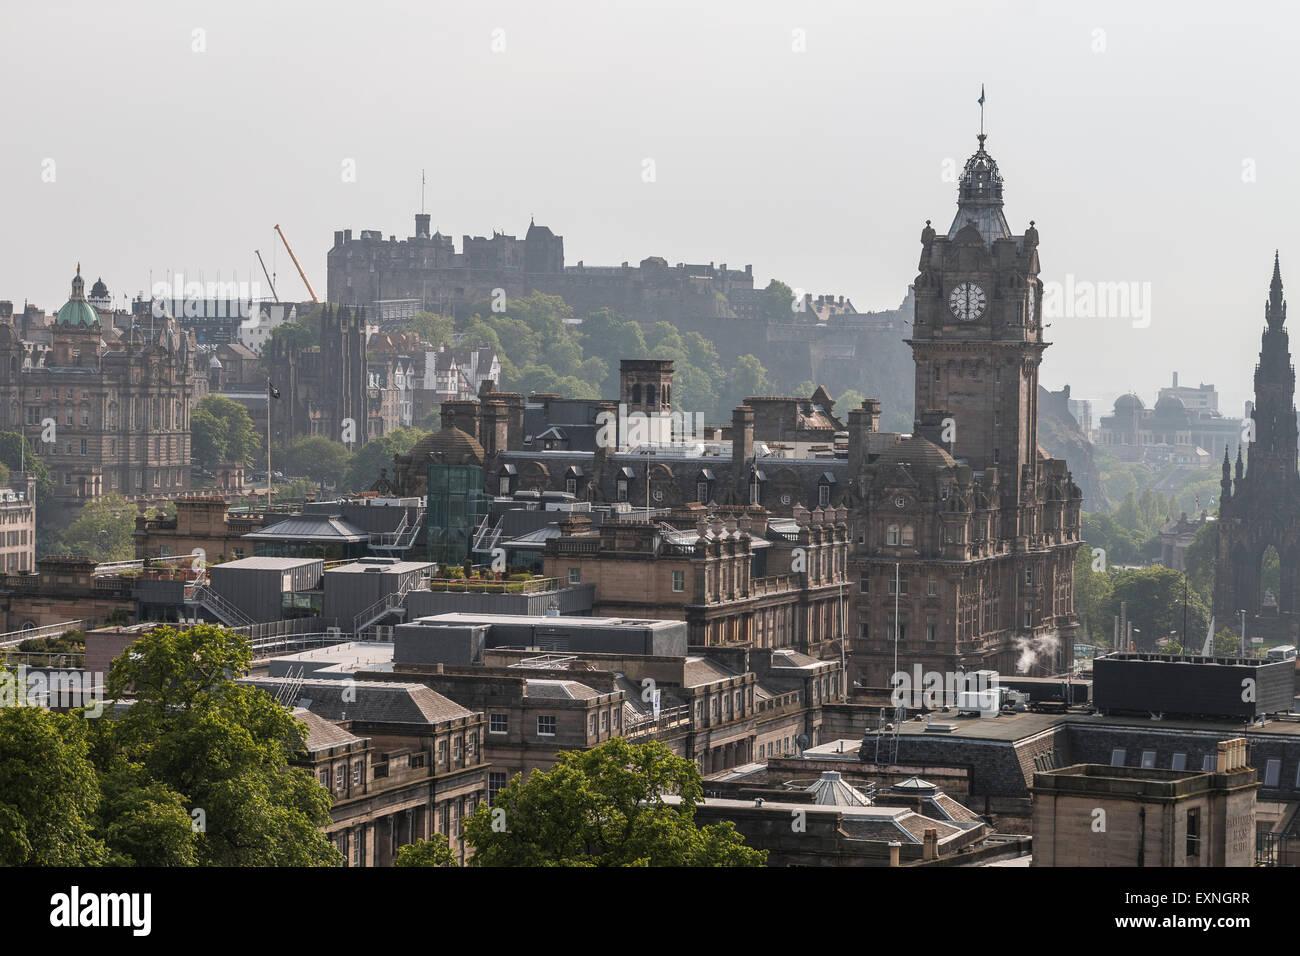 Traveling to Edinburgh - Stock Image